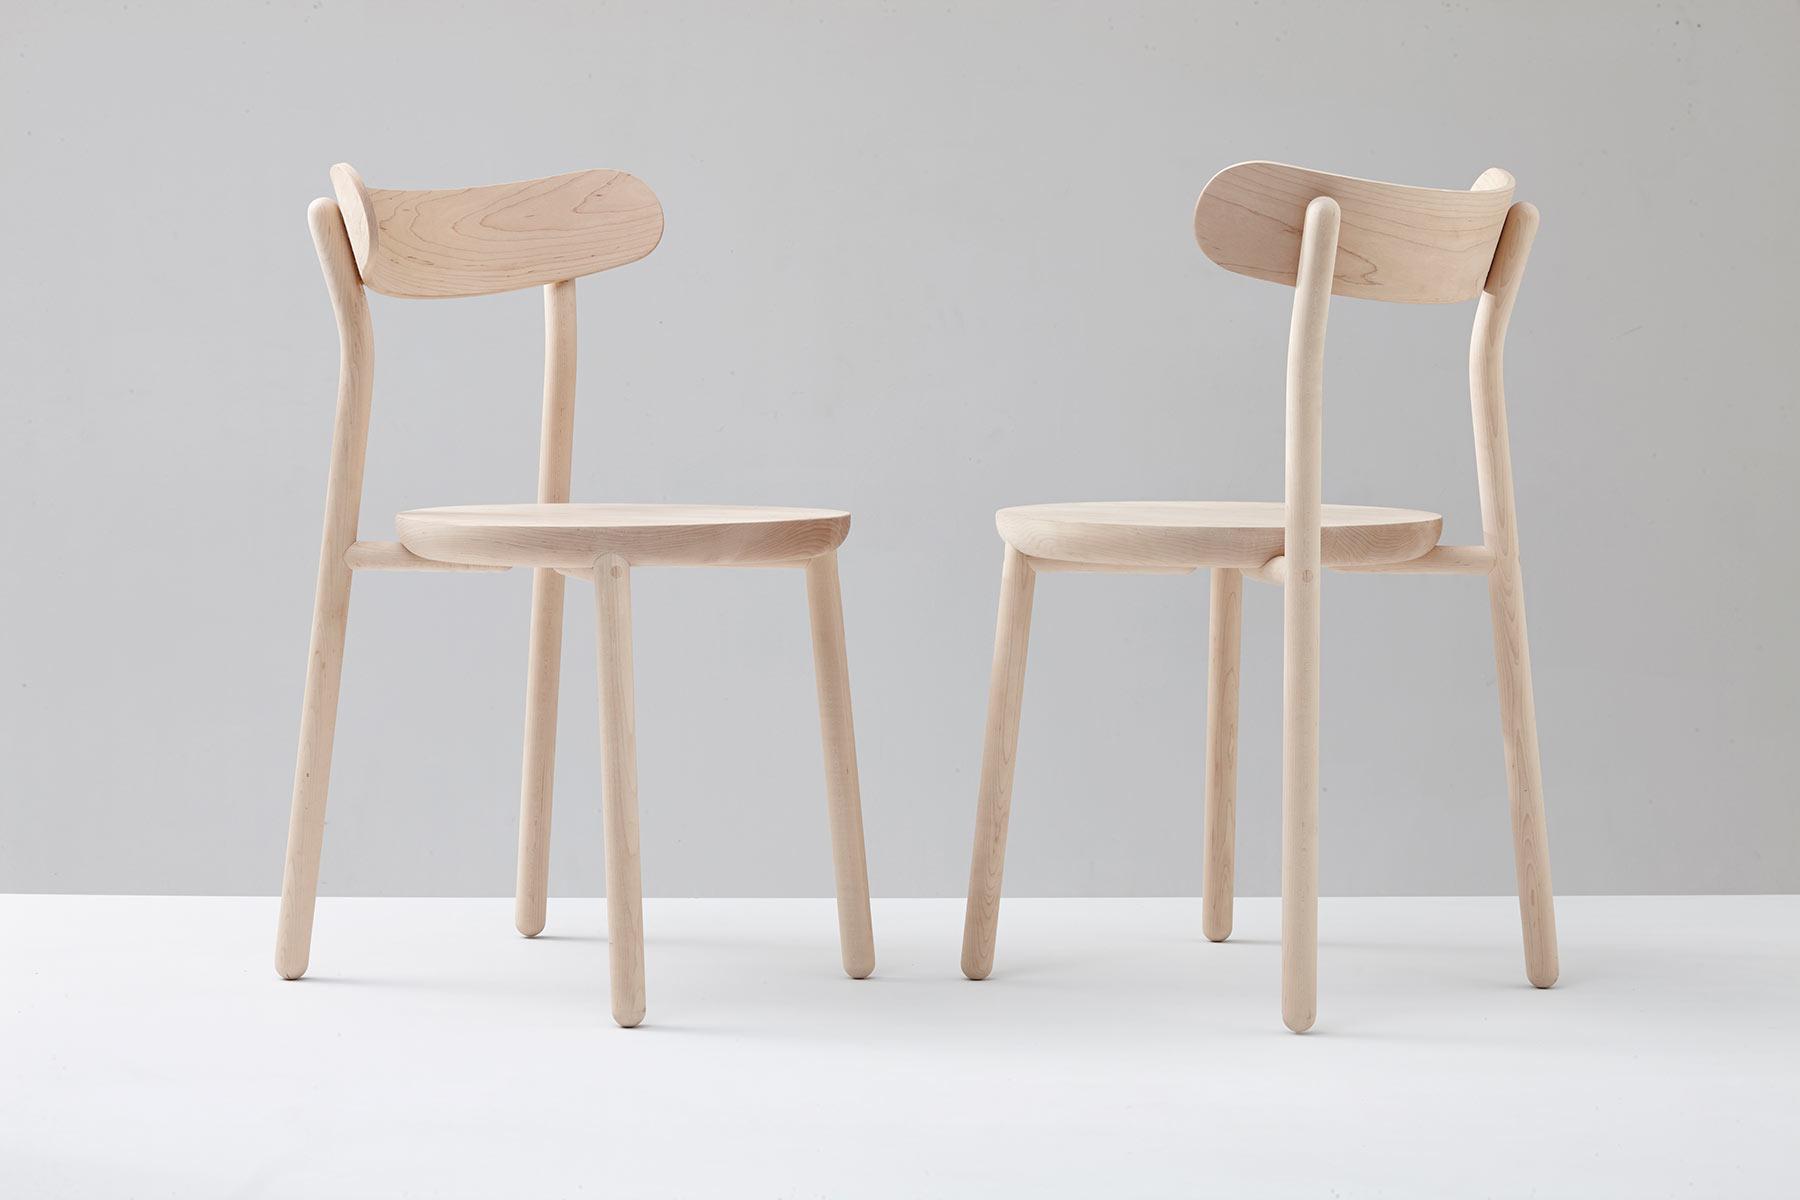 Them Chair by Nicholas Karlovasitis & Sarah Gibson for DesignbyThem